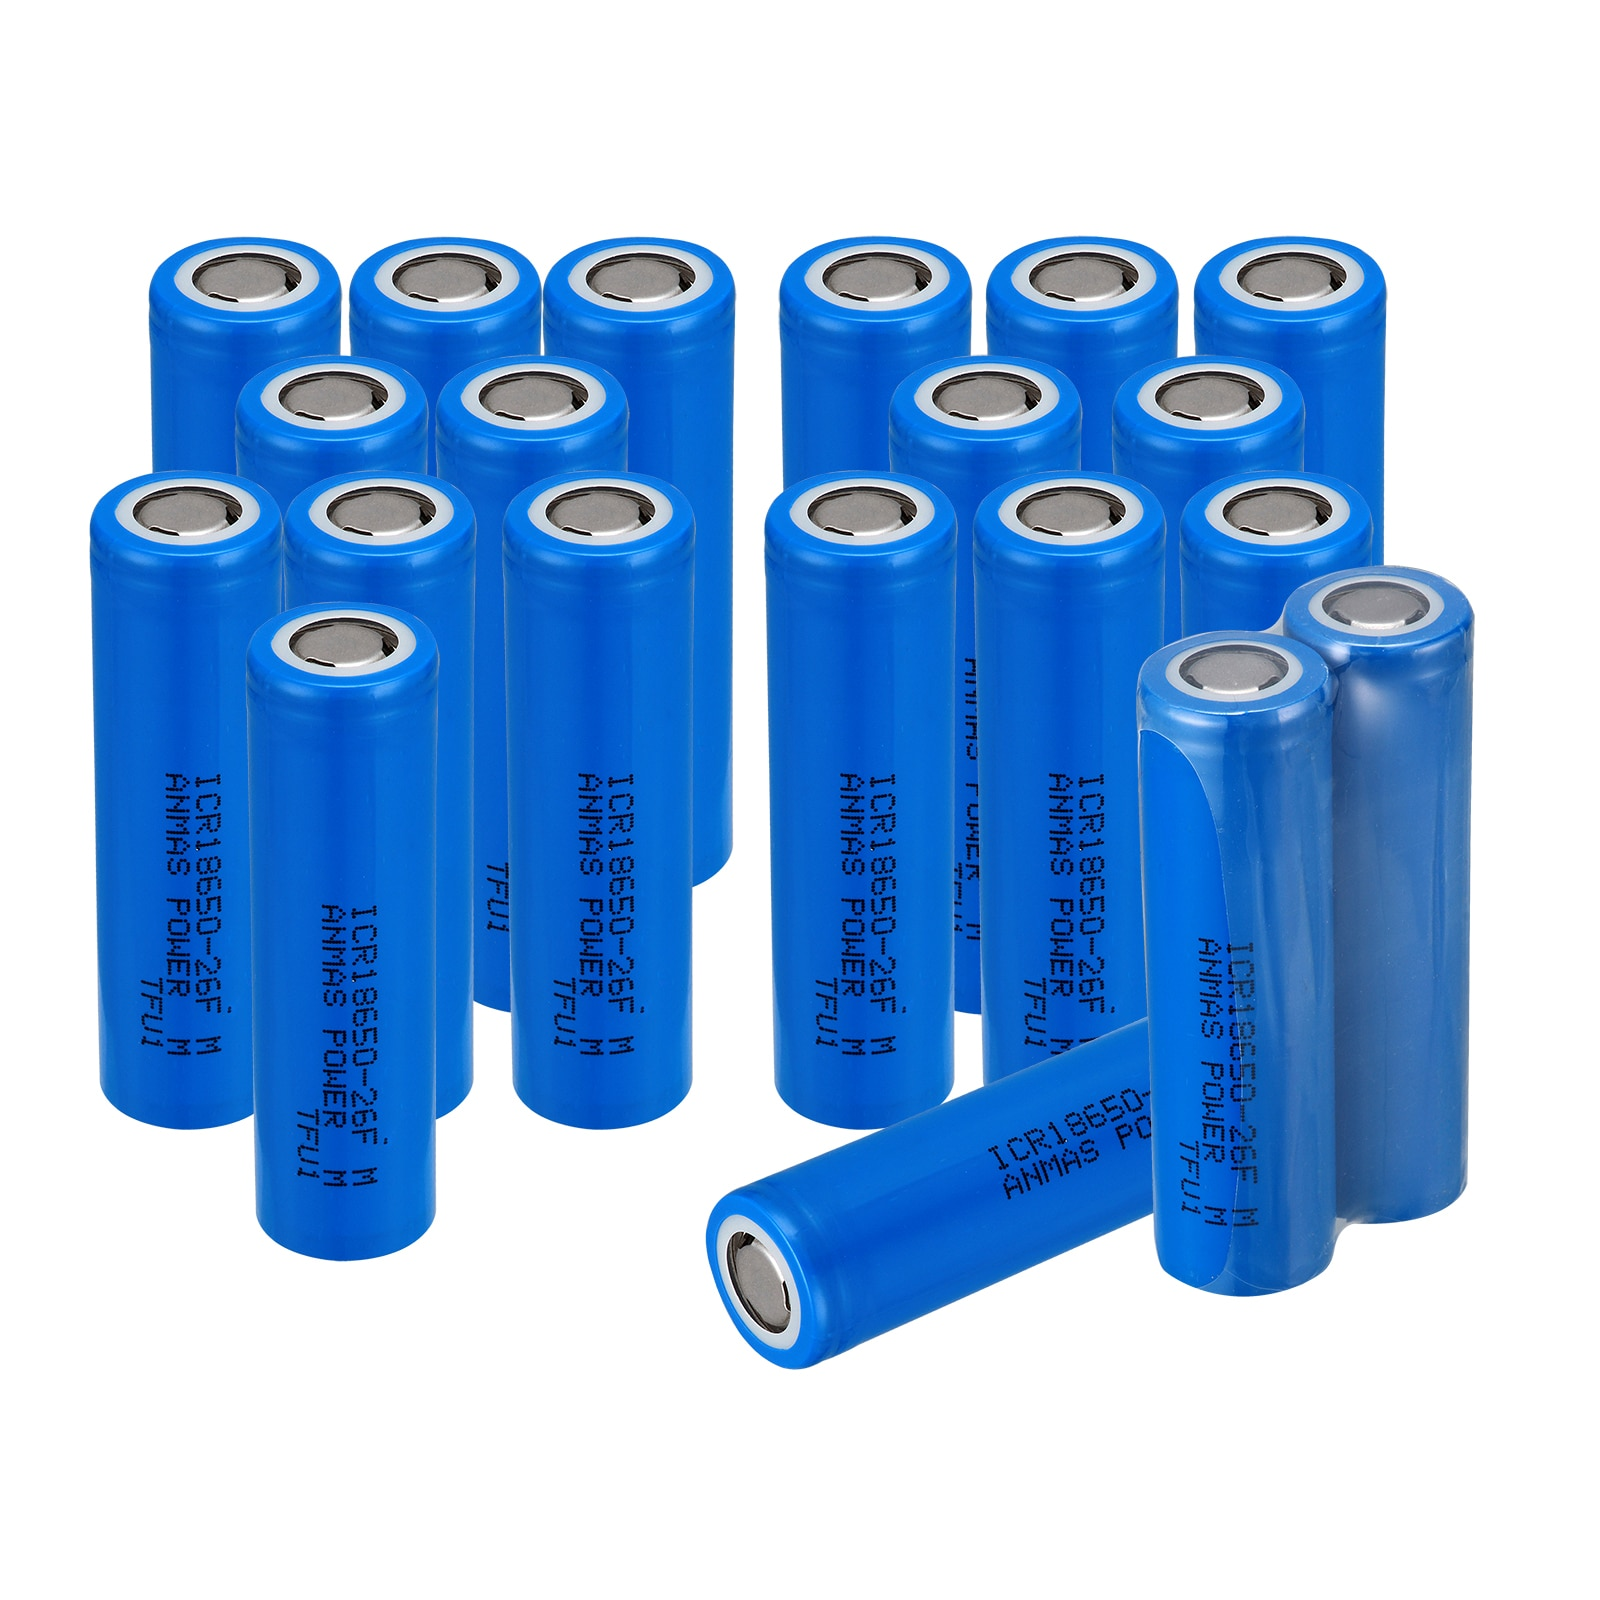 10-20 stücke Anmas Power Blau 2600mAh ICR 18650 26F 3,7 V 2600mAH Li-Ion Flache Top Wiederaufladbare batterien Batterie